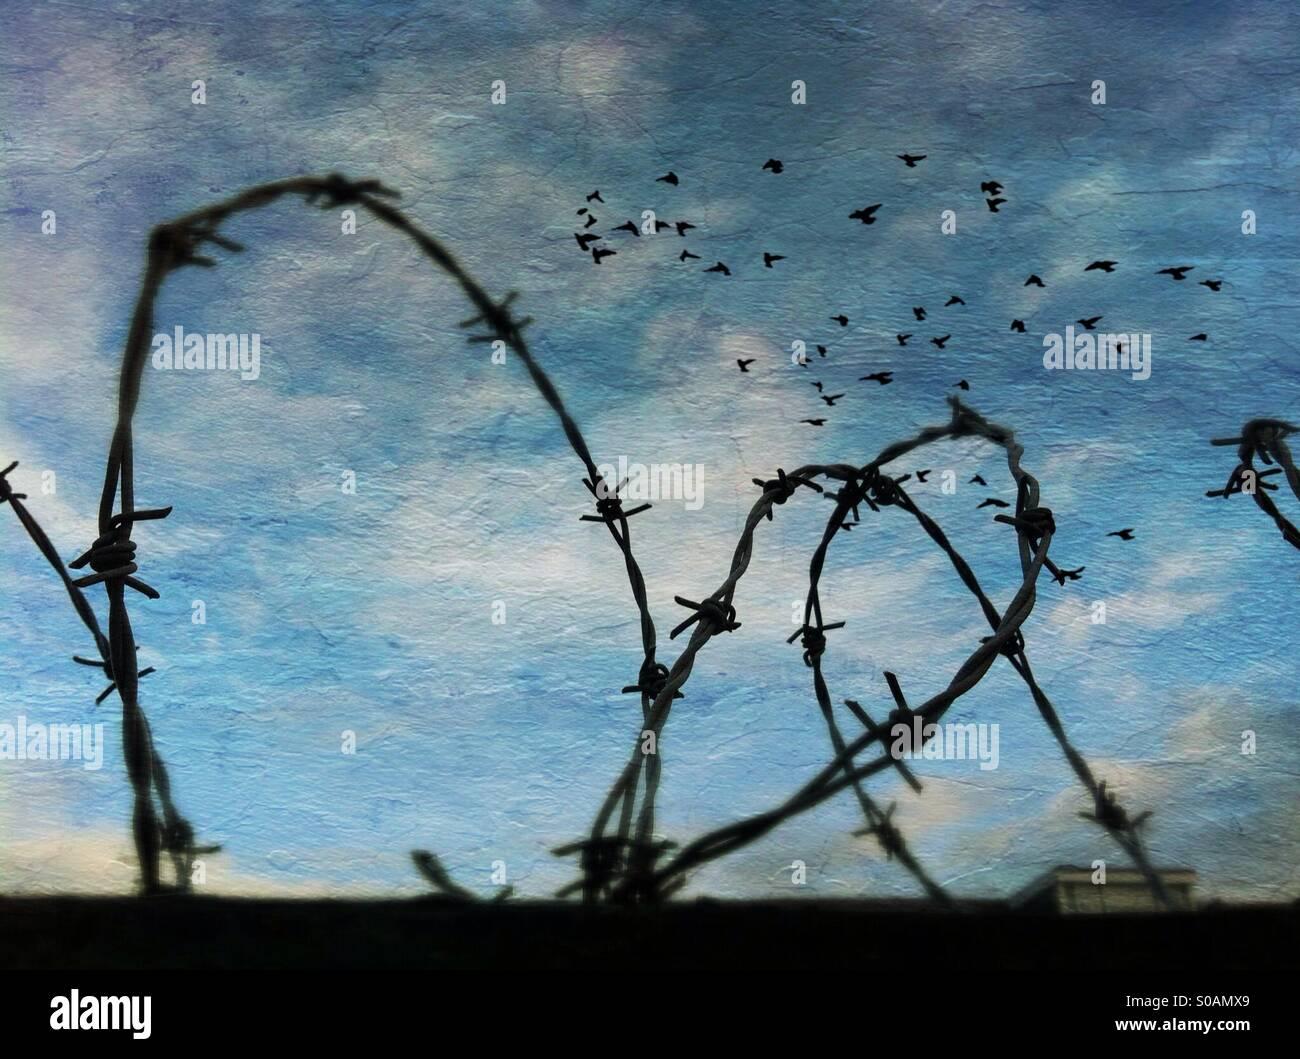 Stacheldraht und Vögel im Flug gegen blauen Himmel. Stockbild